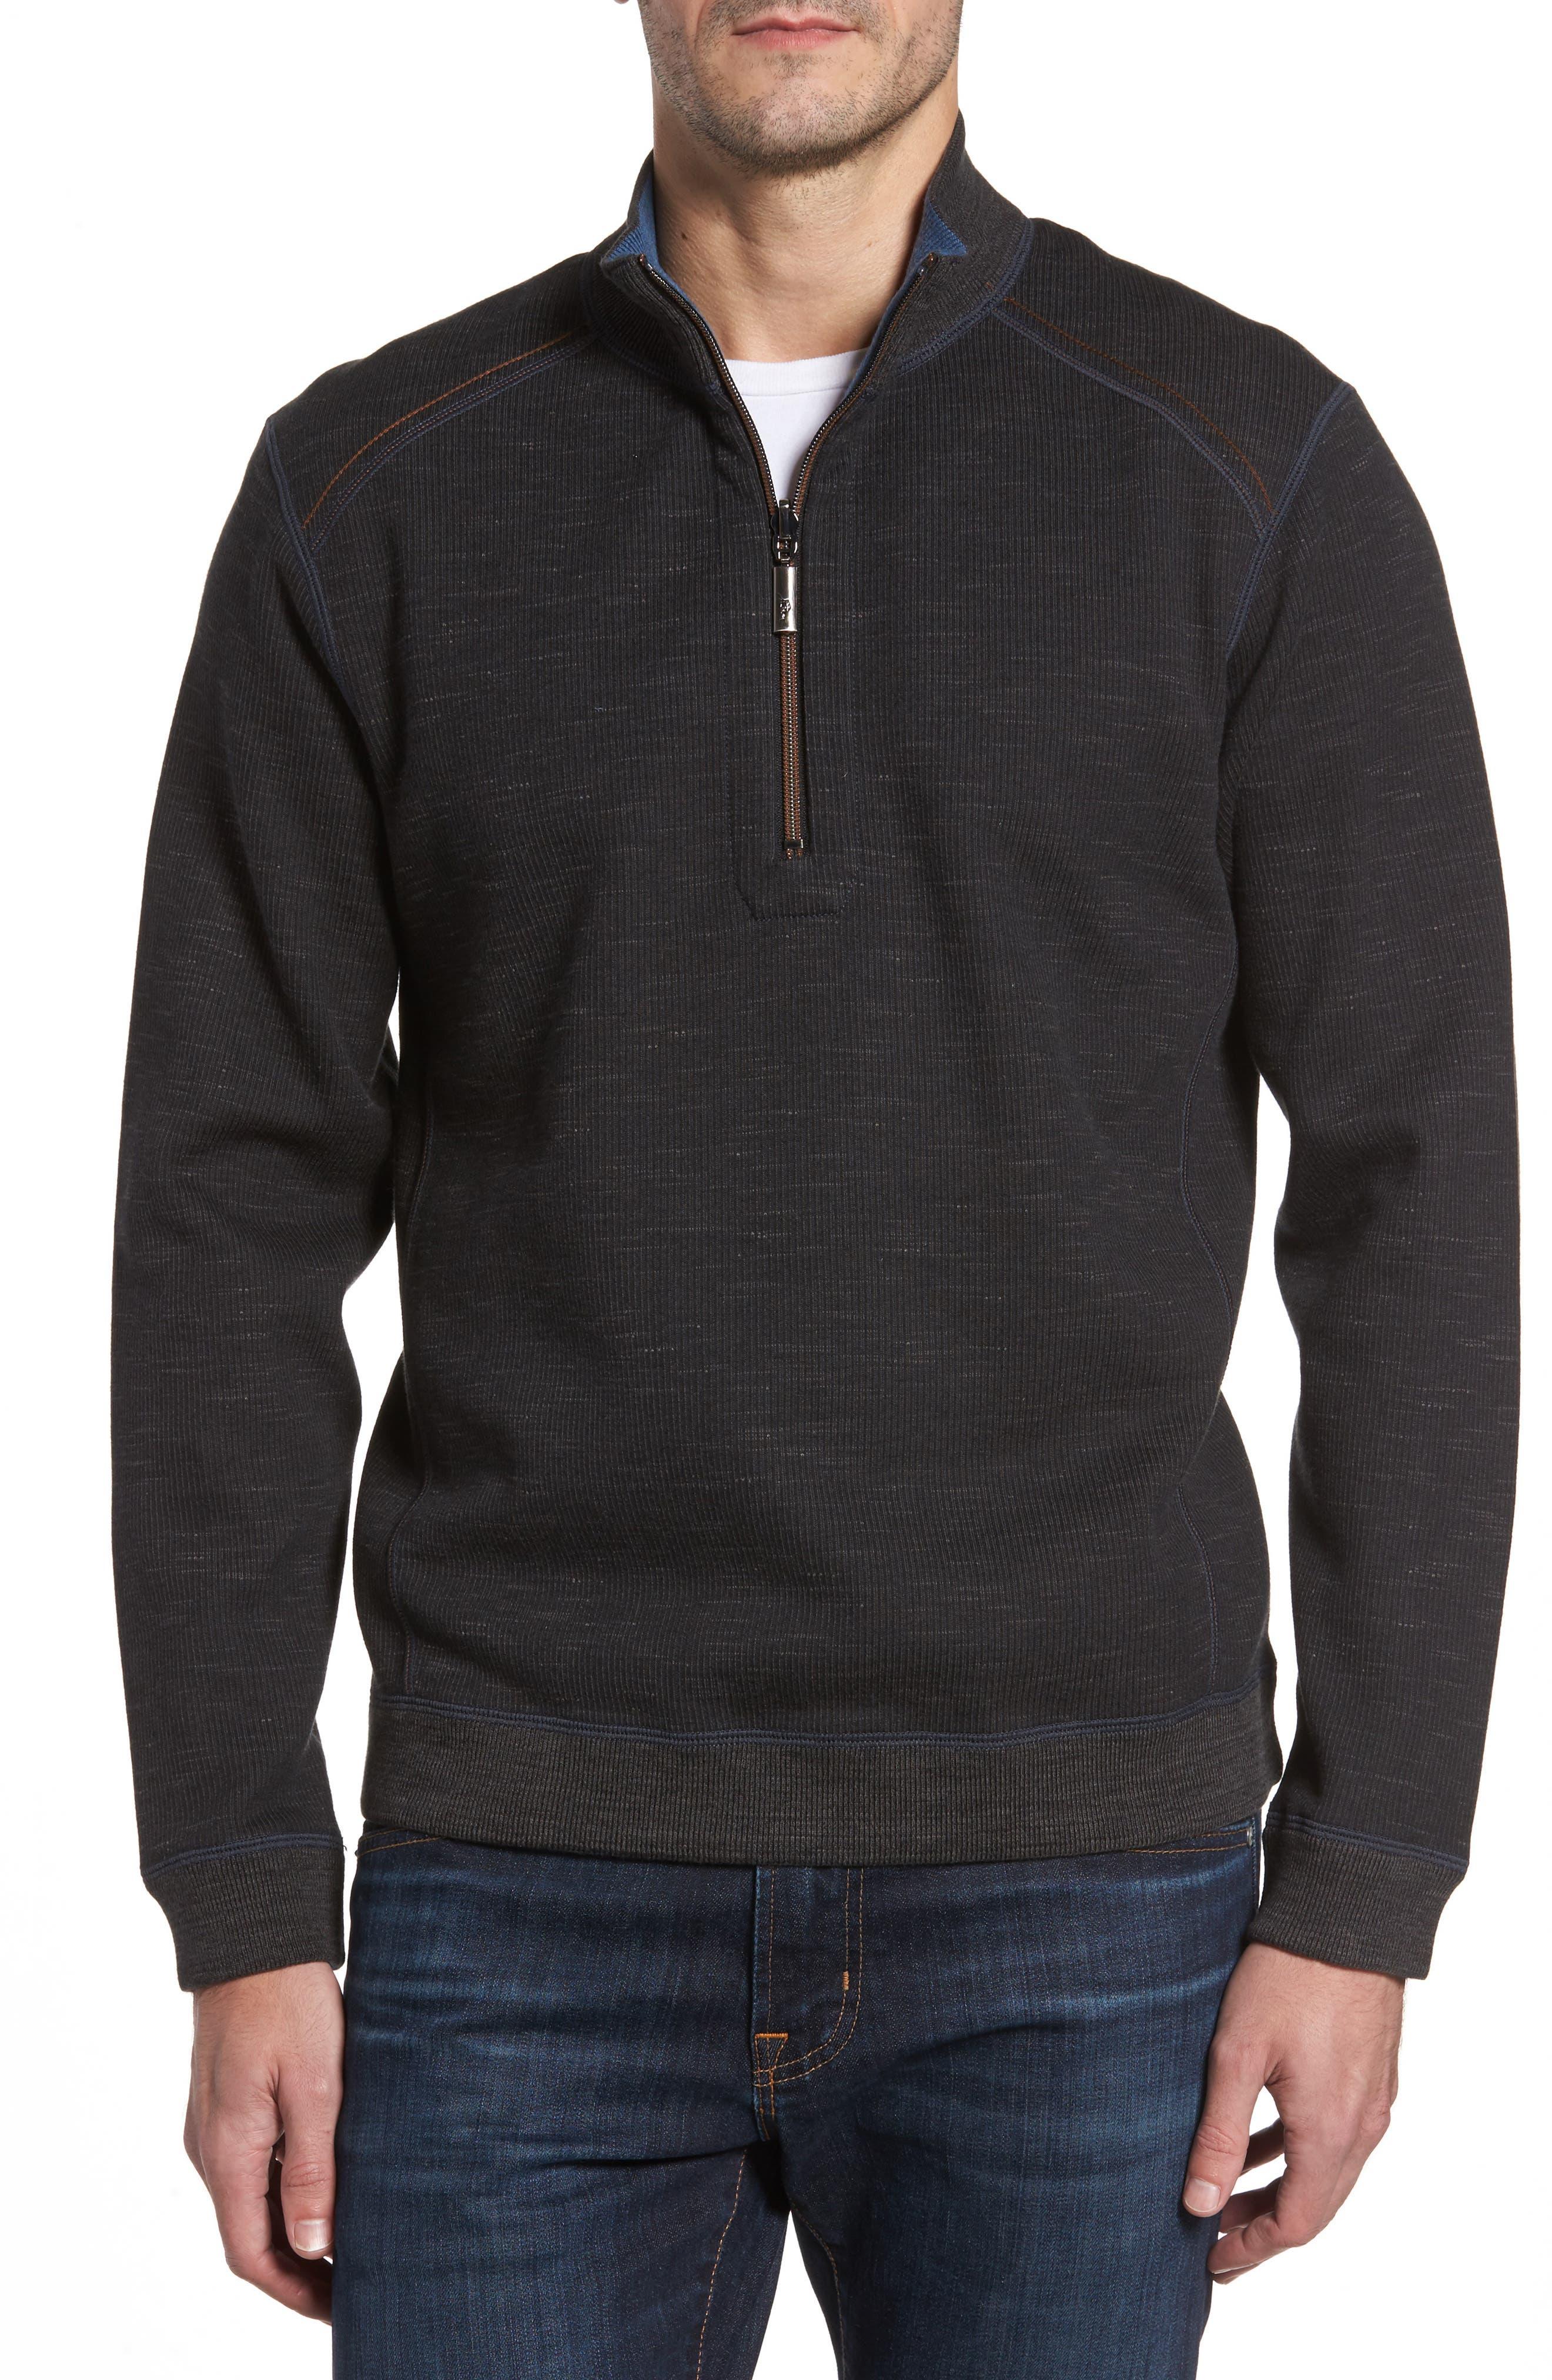 Flipsider Half Zip Reversible Sweatshirt,                             Main thumbnail 1, color,                             003